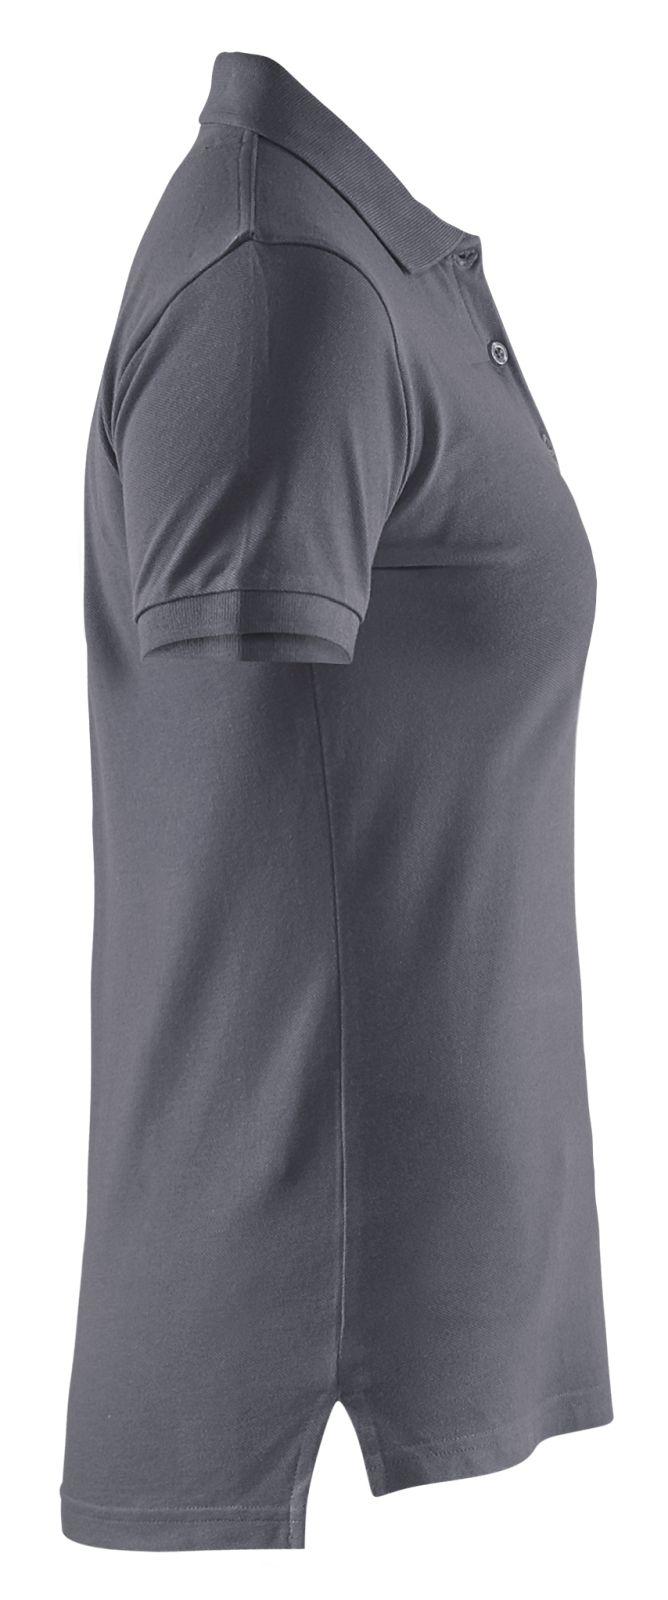 Blaklader Dames polo shirts 33071035 grijs(9400)